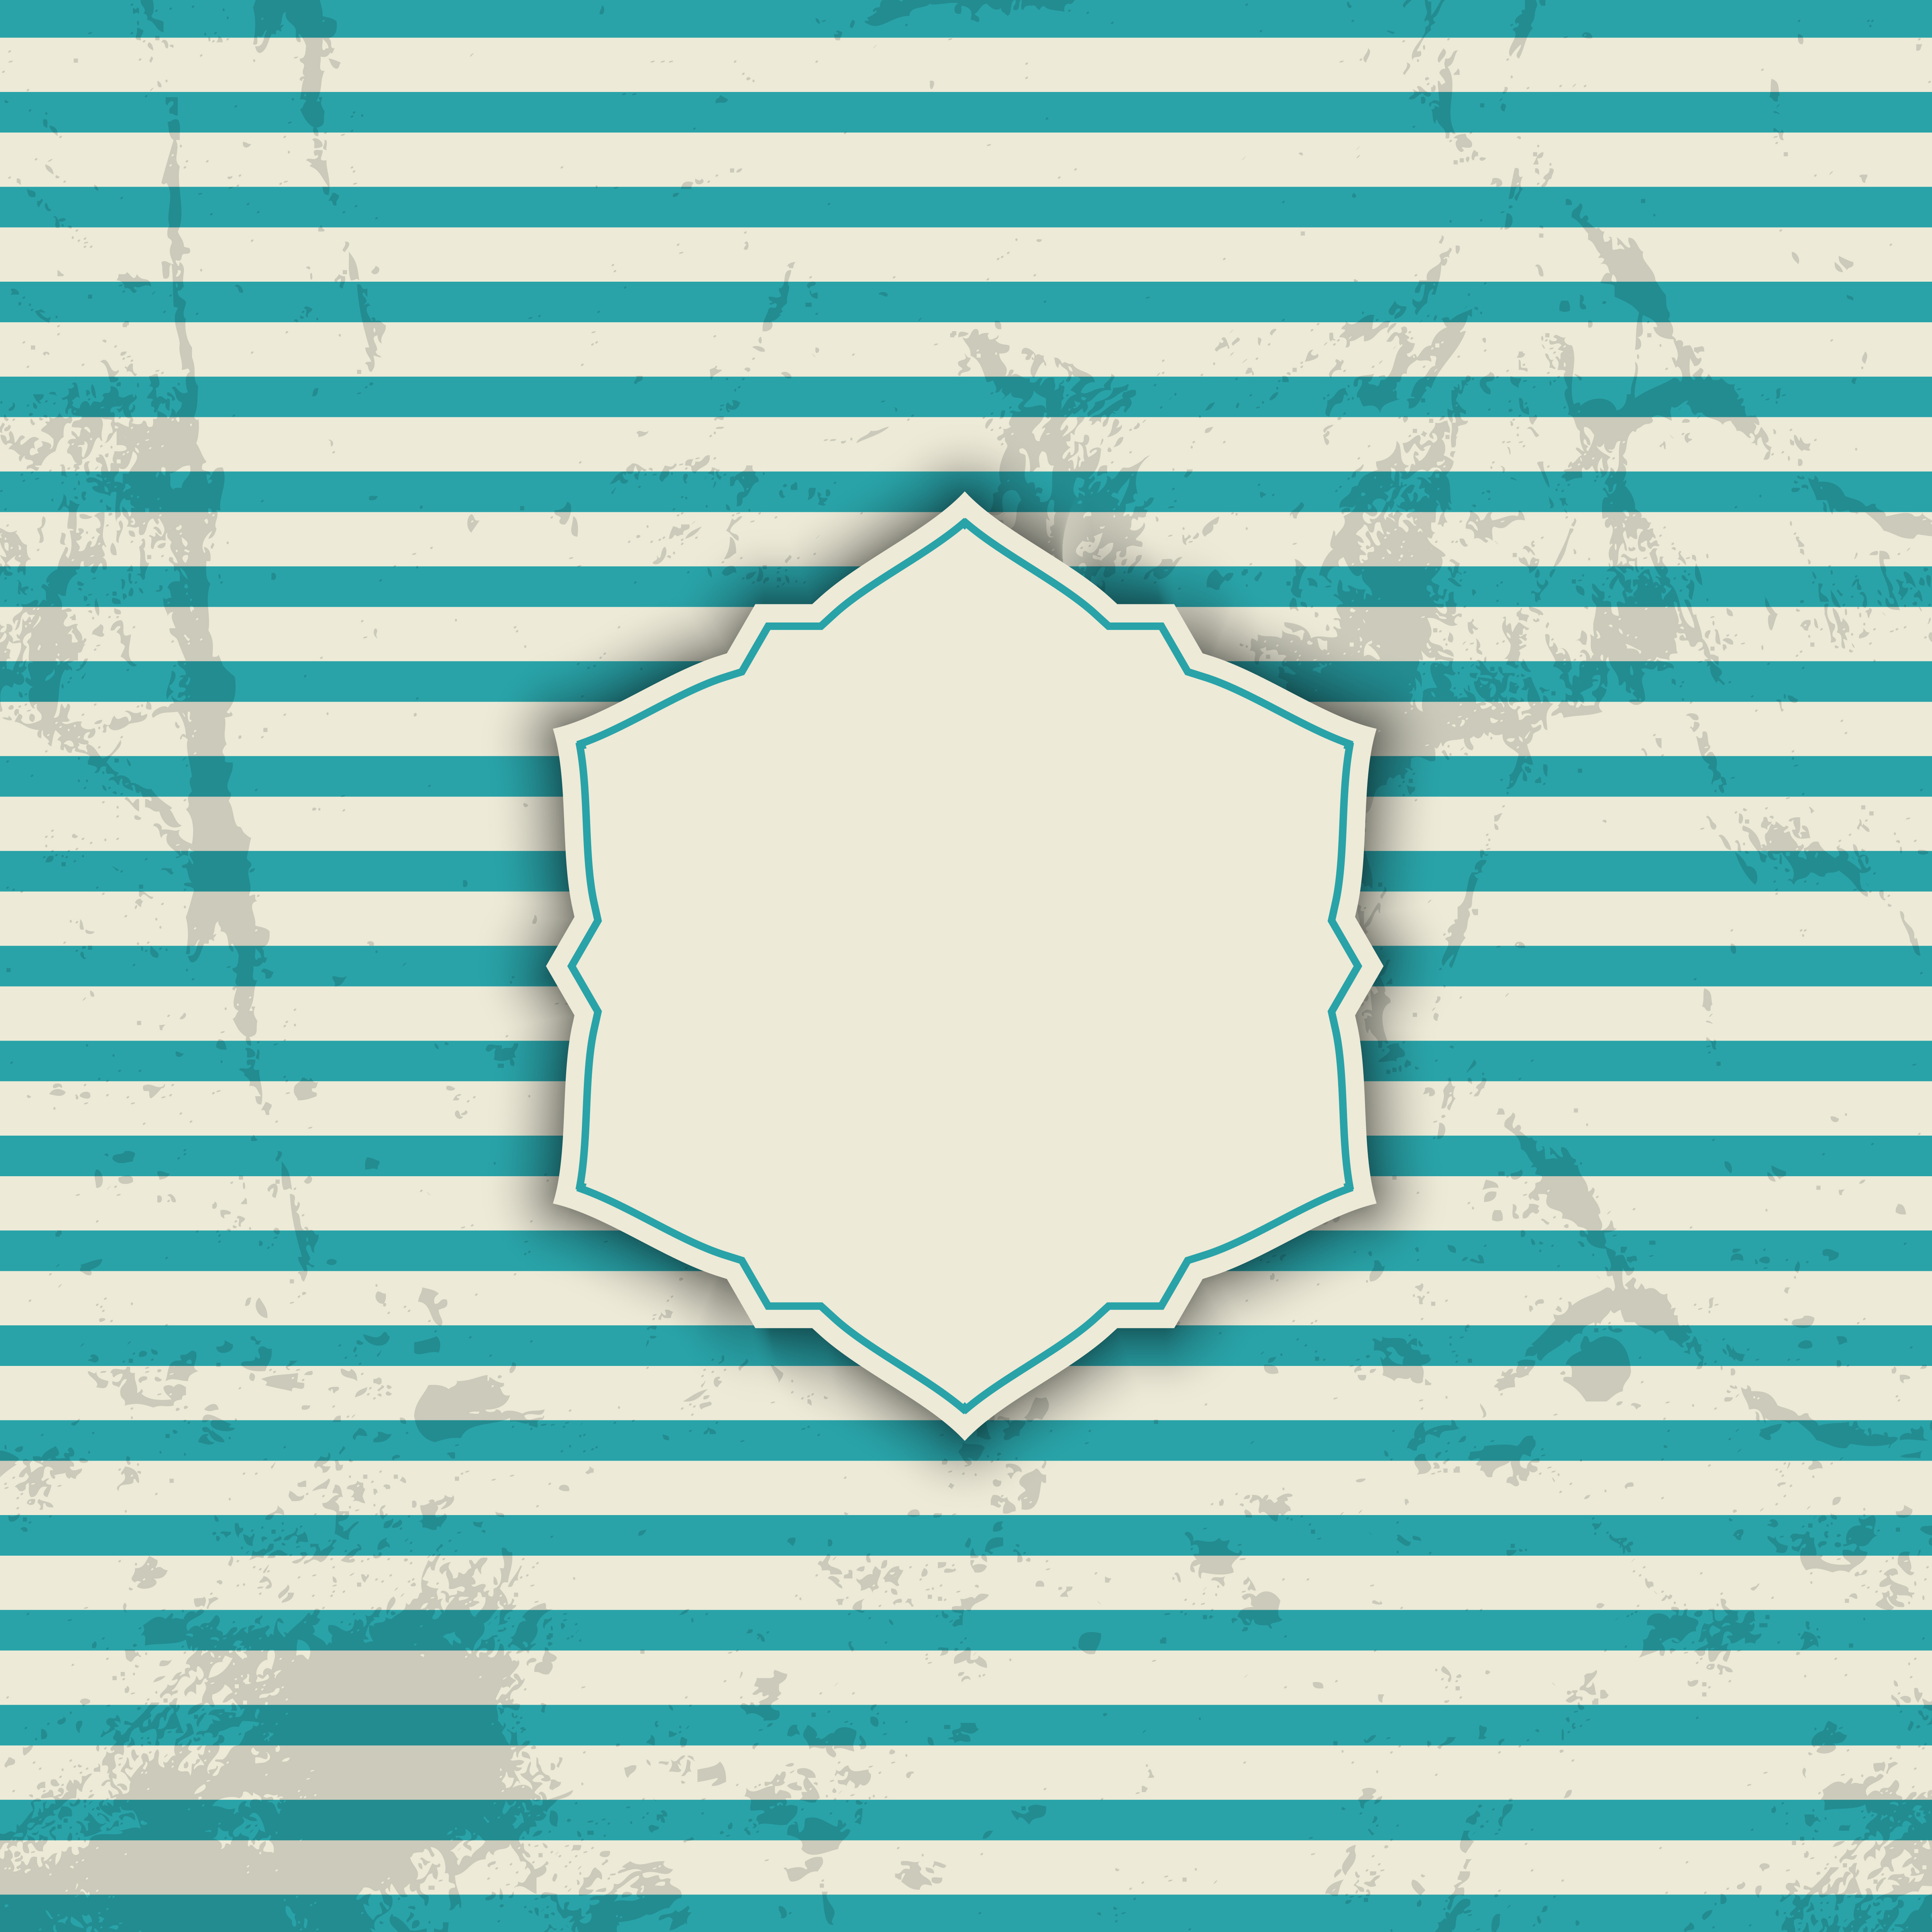 Vintage Striped Background Download Free Vectors Clipart Graphics Vector Art Copy & paste css patterns for your website. vecteezy